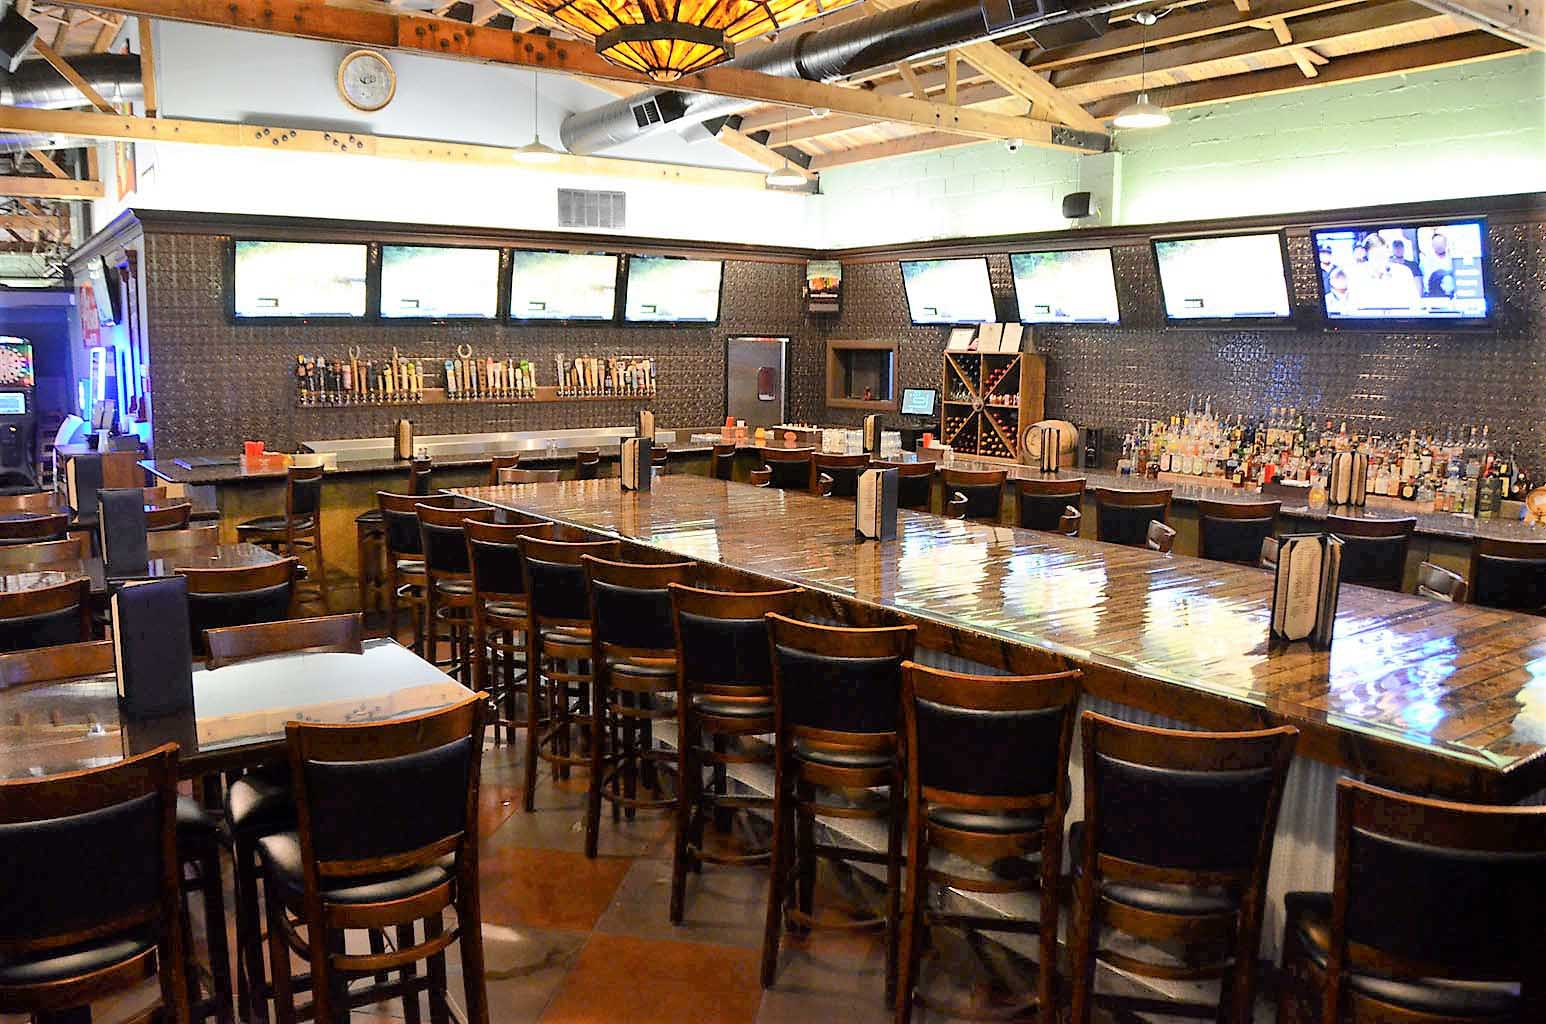 Hoppy Pig Bar & Grill - BradleyIllinois